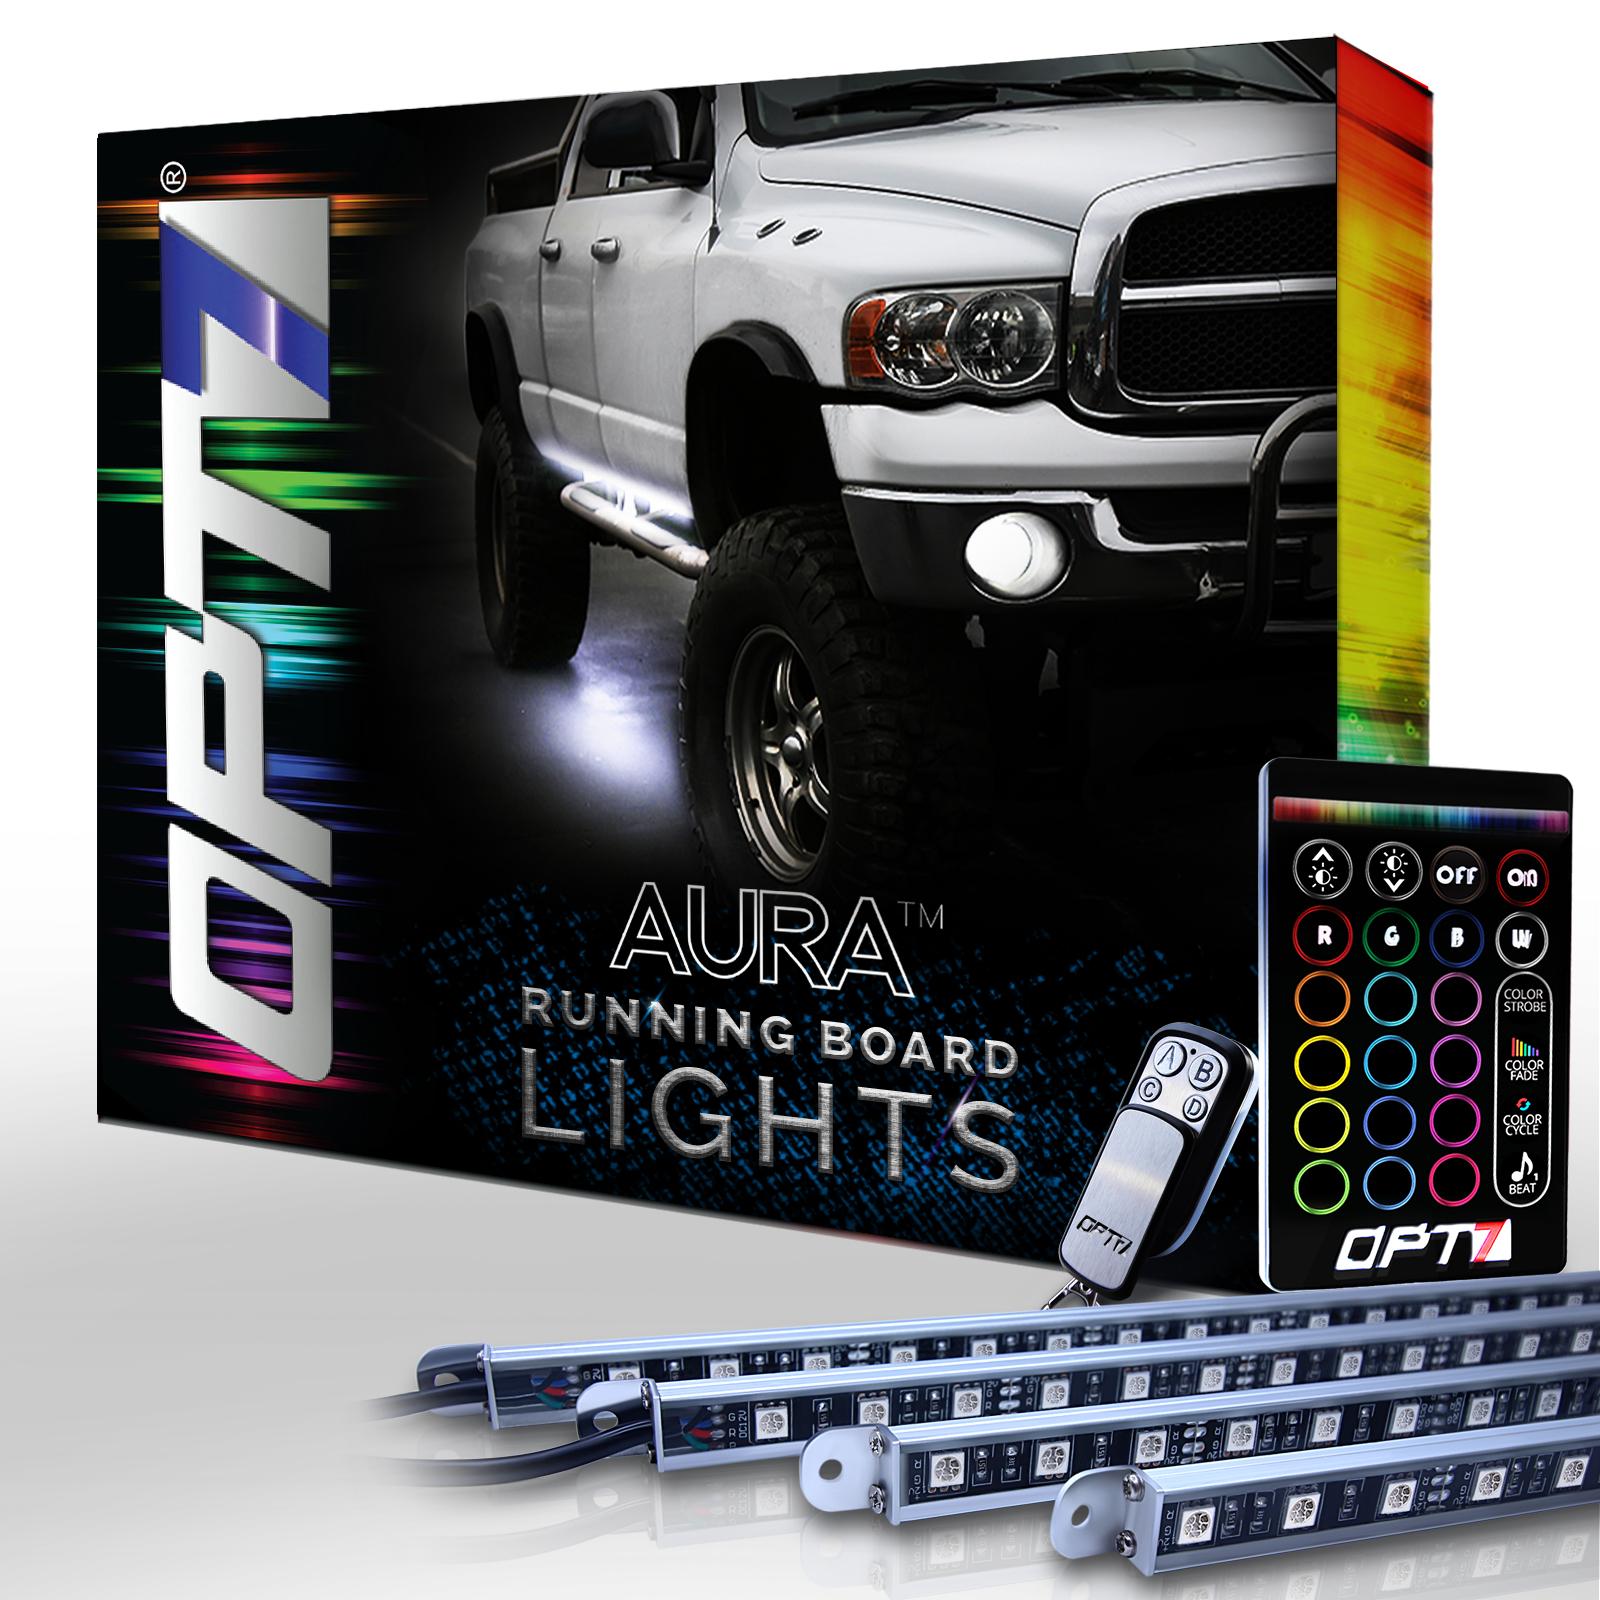 Aura LED Running Board Lights by OPT7 Lighting - Nerf Light Side Bar Step Kit for Trucks, SUVs, RV, & Big Rigs - 4 Bars, 16 Color Options, Flash Settings, Sound Sync Mode & 2 Remotes - 1 YR Warranty